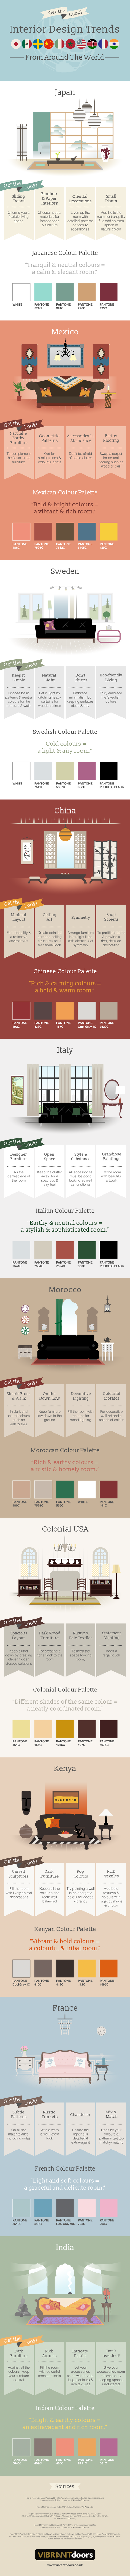 International Interior Design Infographic